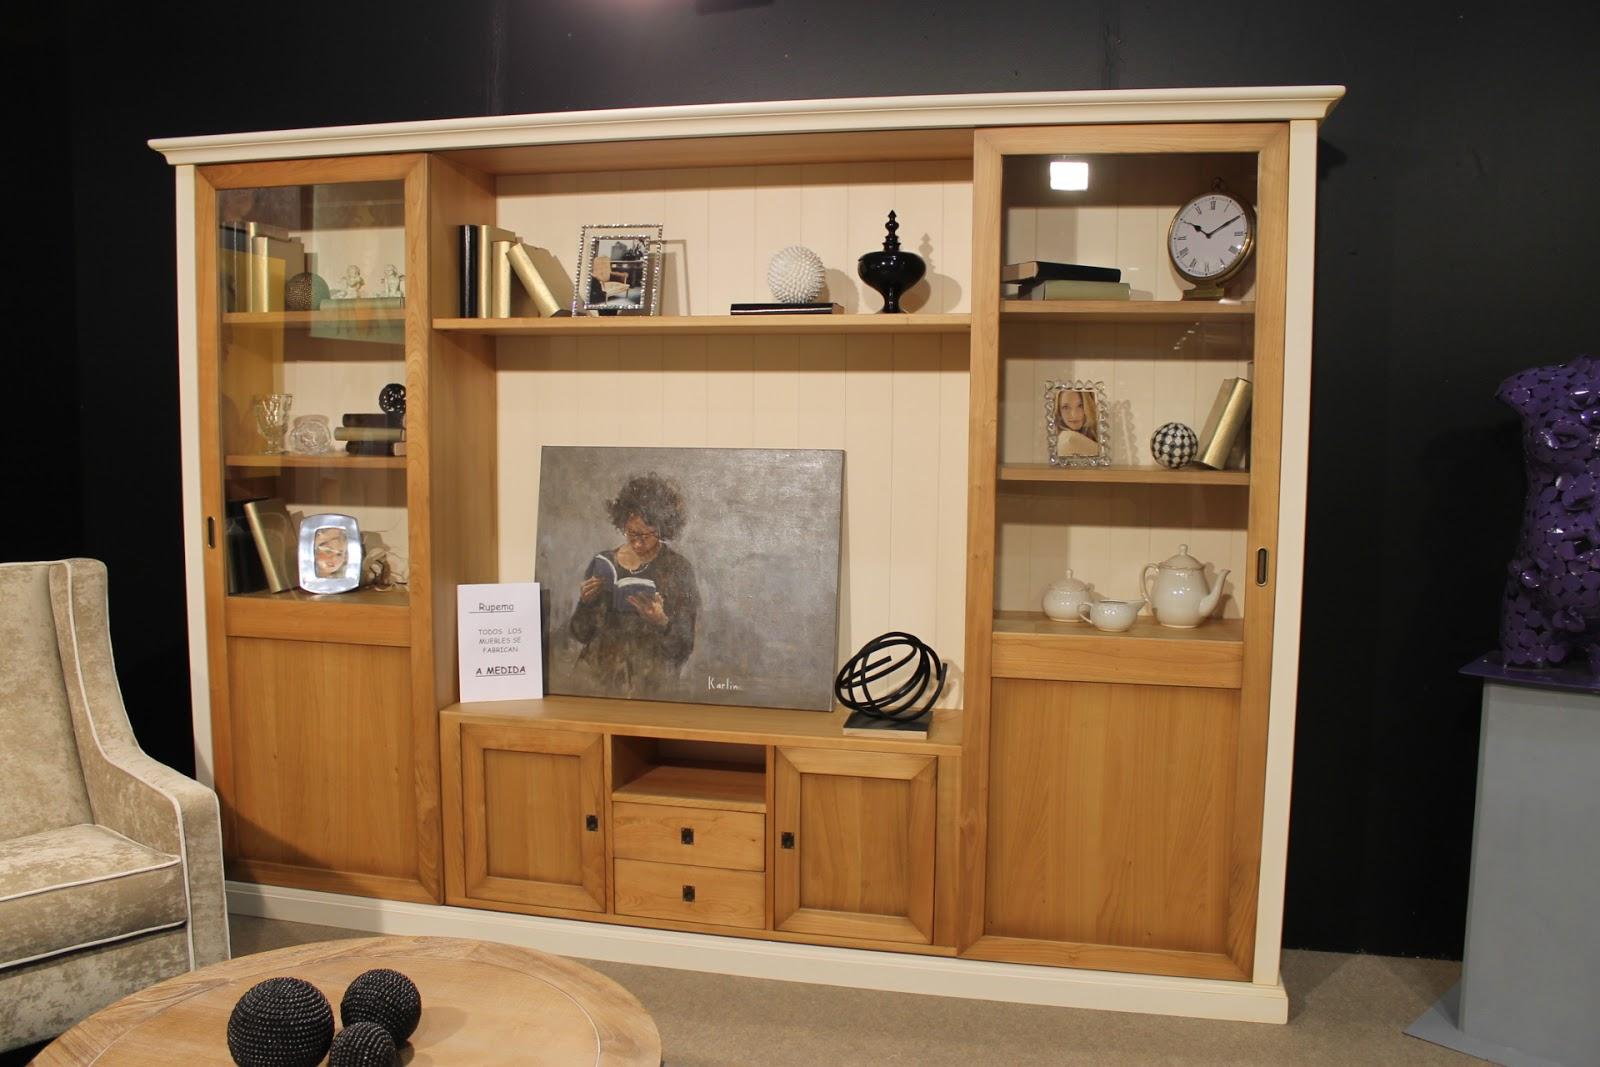 Icono interiorismo muebles rupema icono interiorismo en for Muebles jose antonio